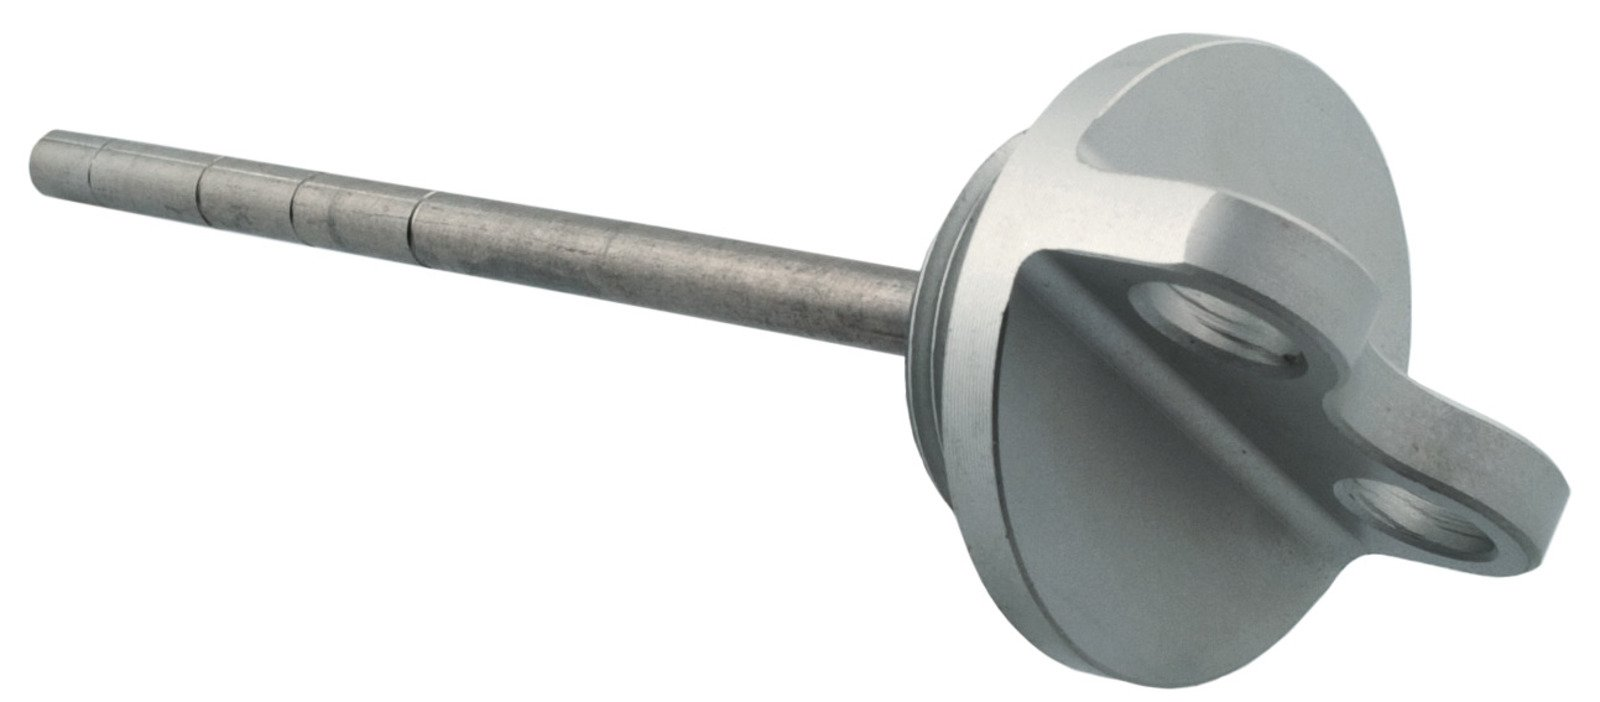 Oil Dipstick Anodized Aluminum For SR400 SR500 TT500 XT500 XT550 XT600 B-007